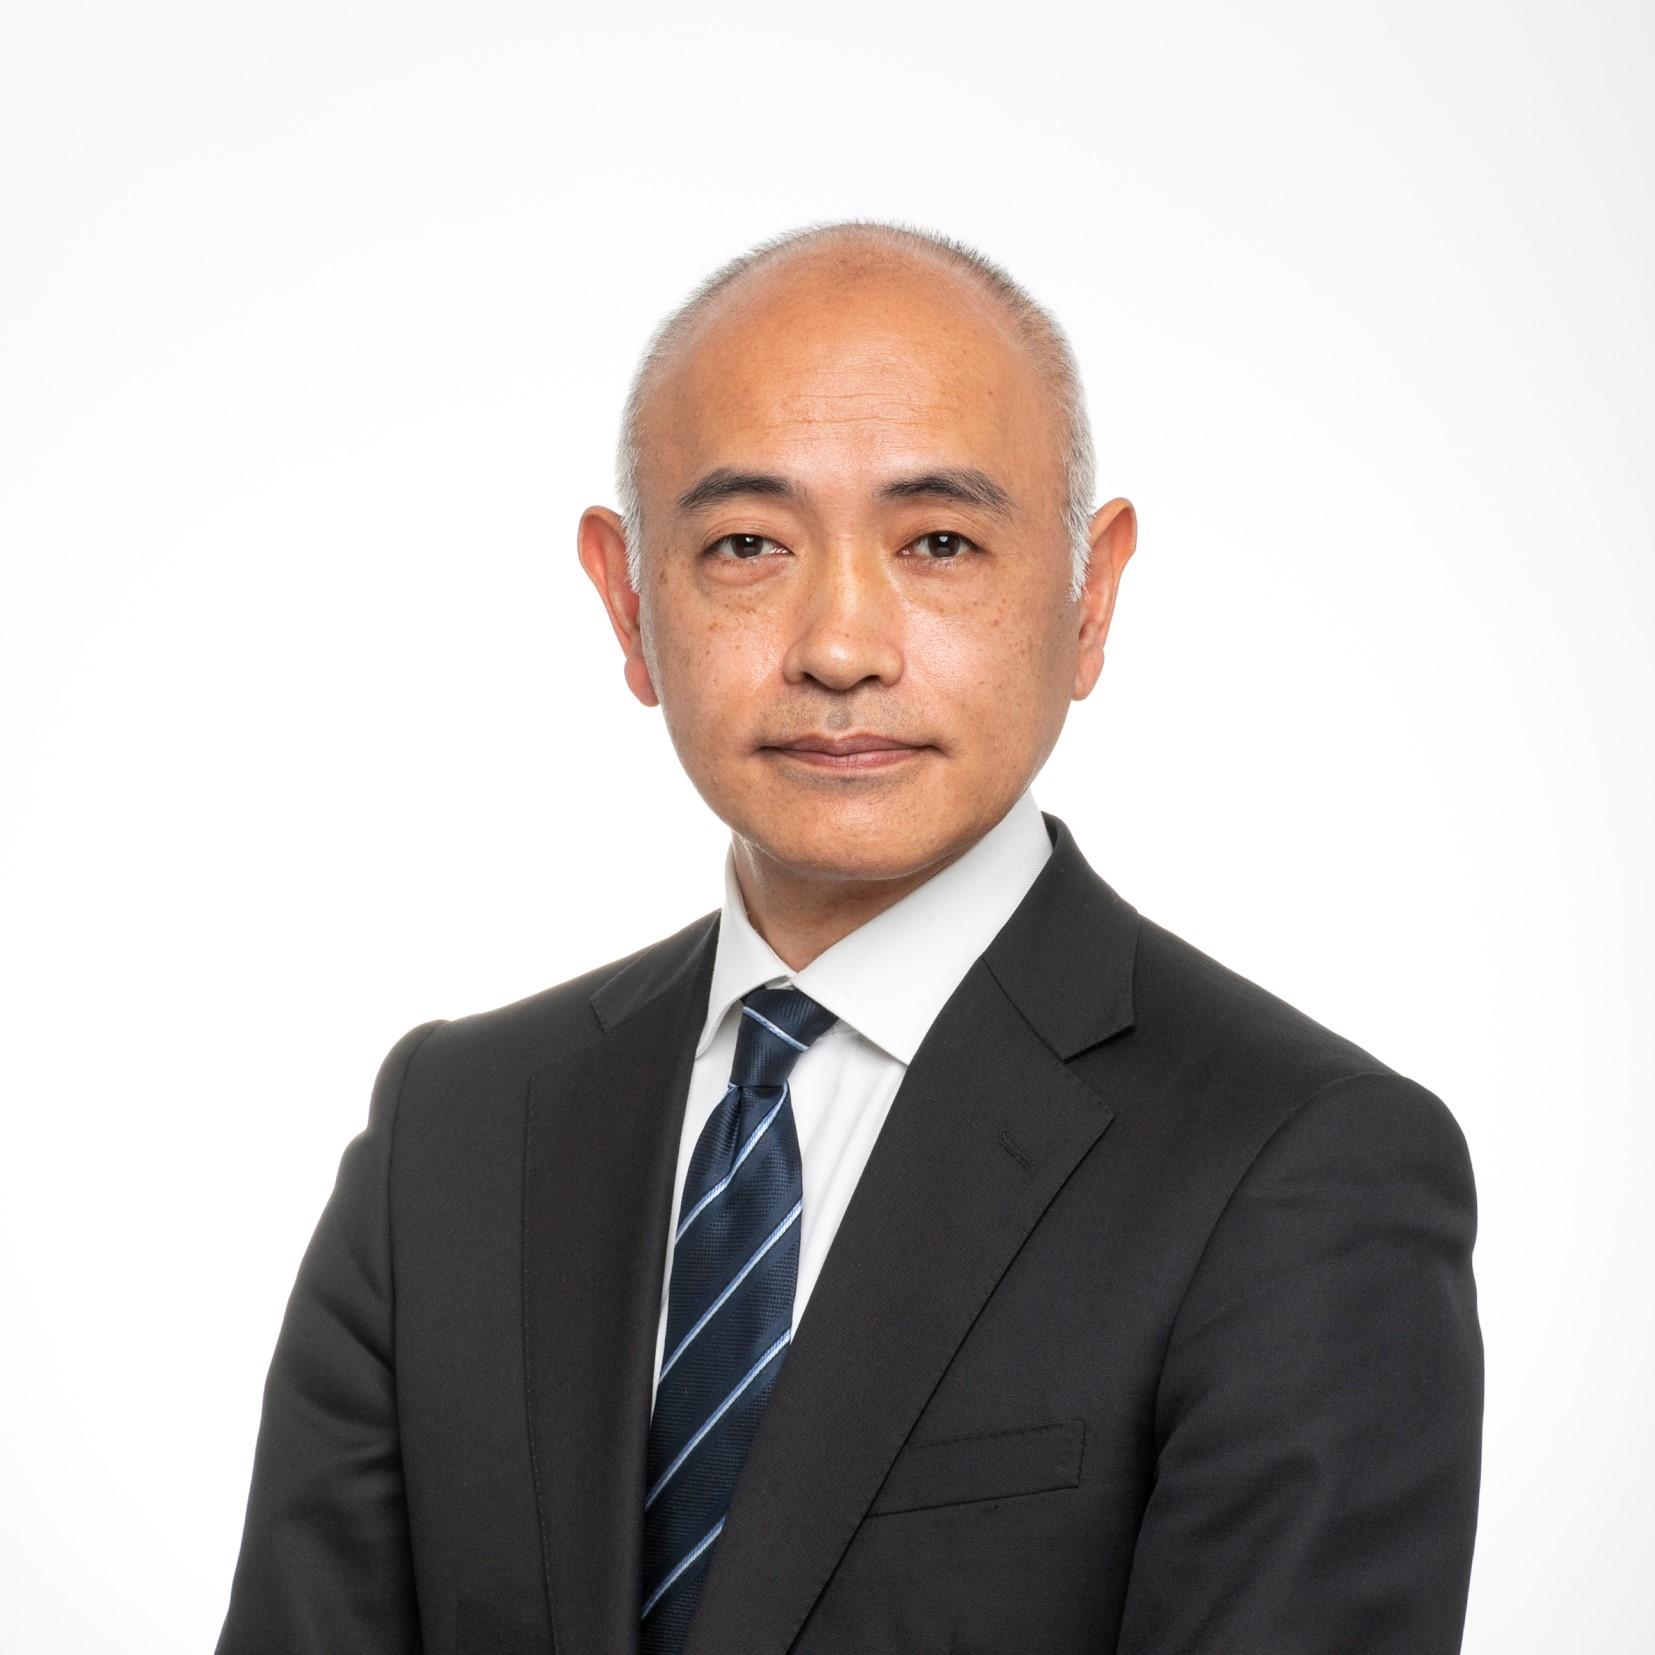 Hiroyuki Kurosaki